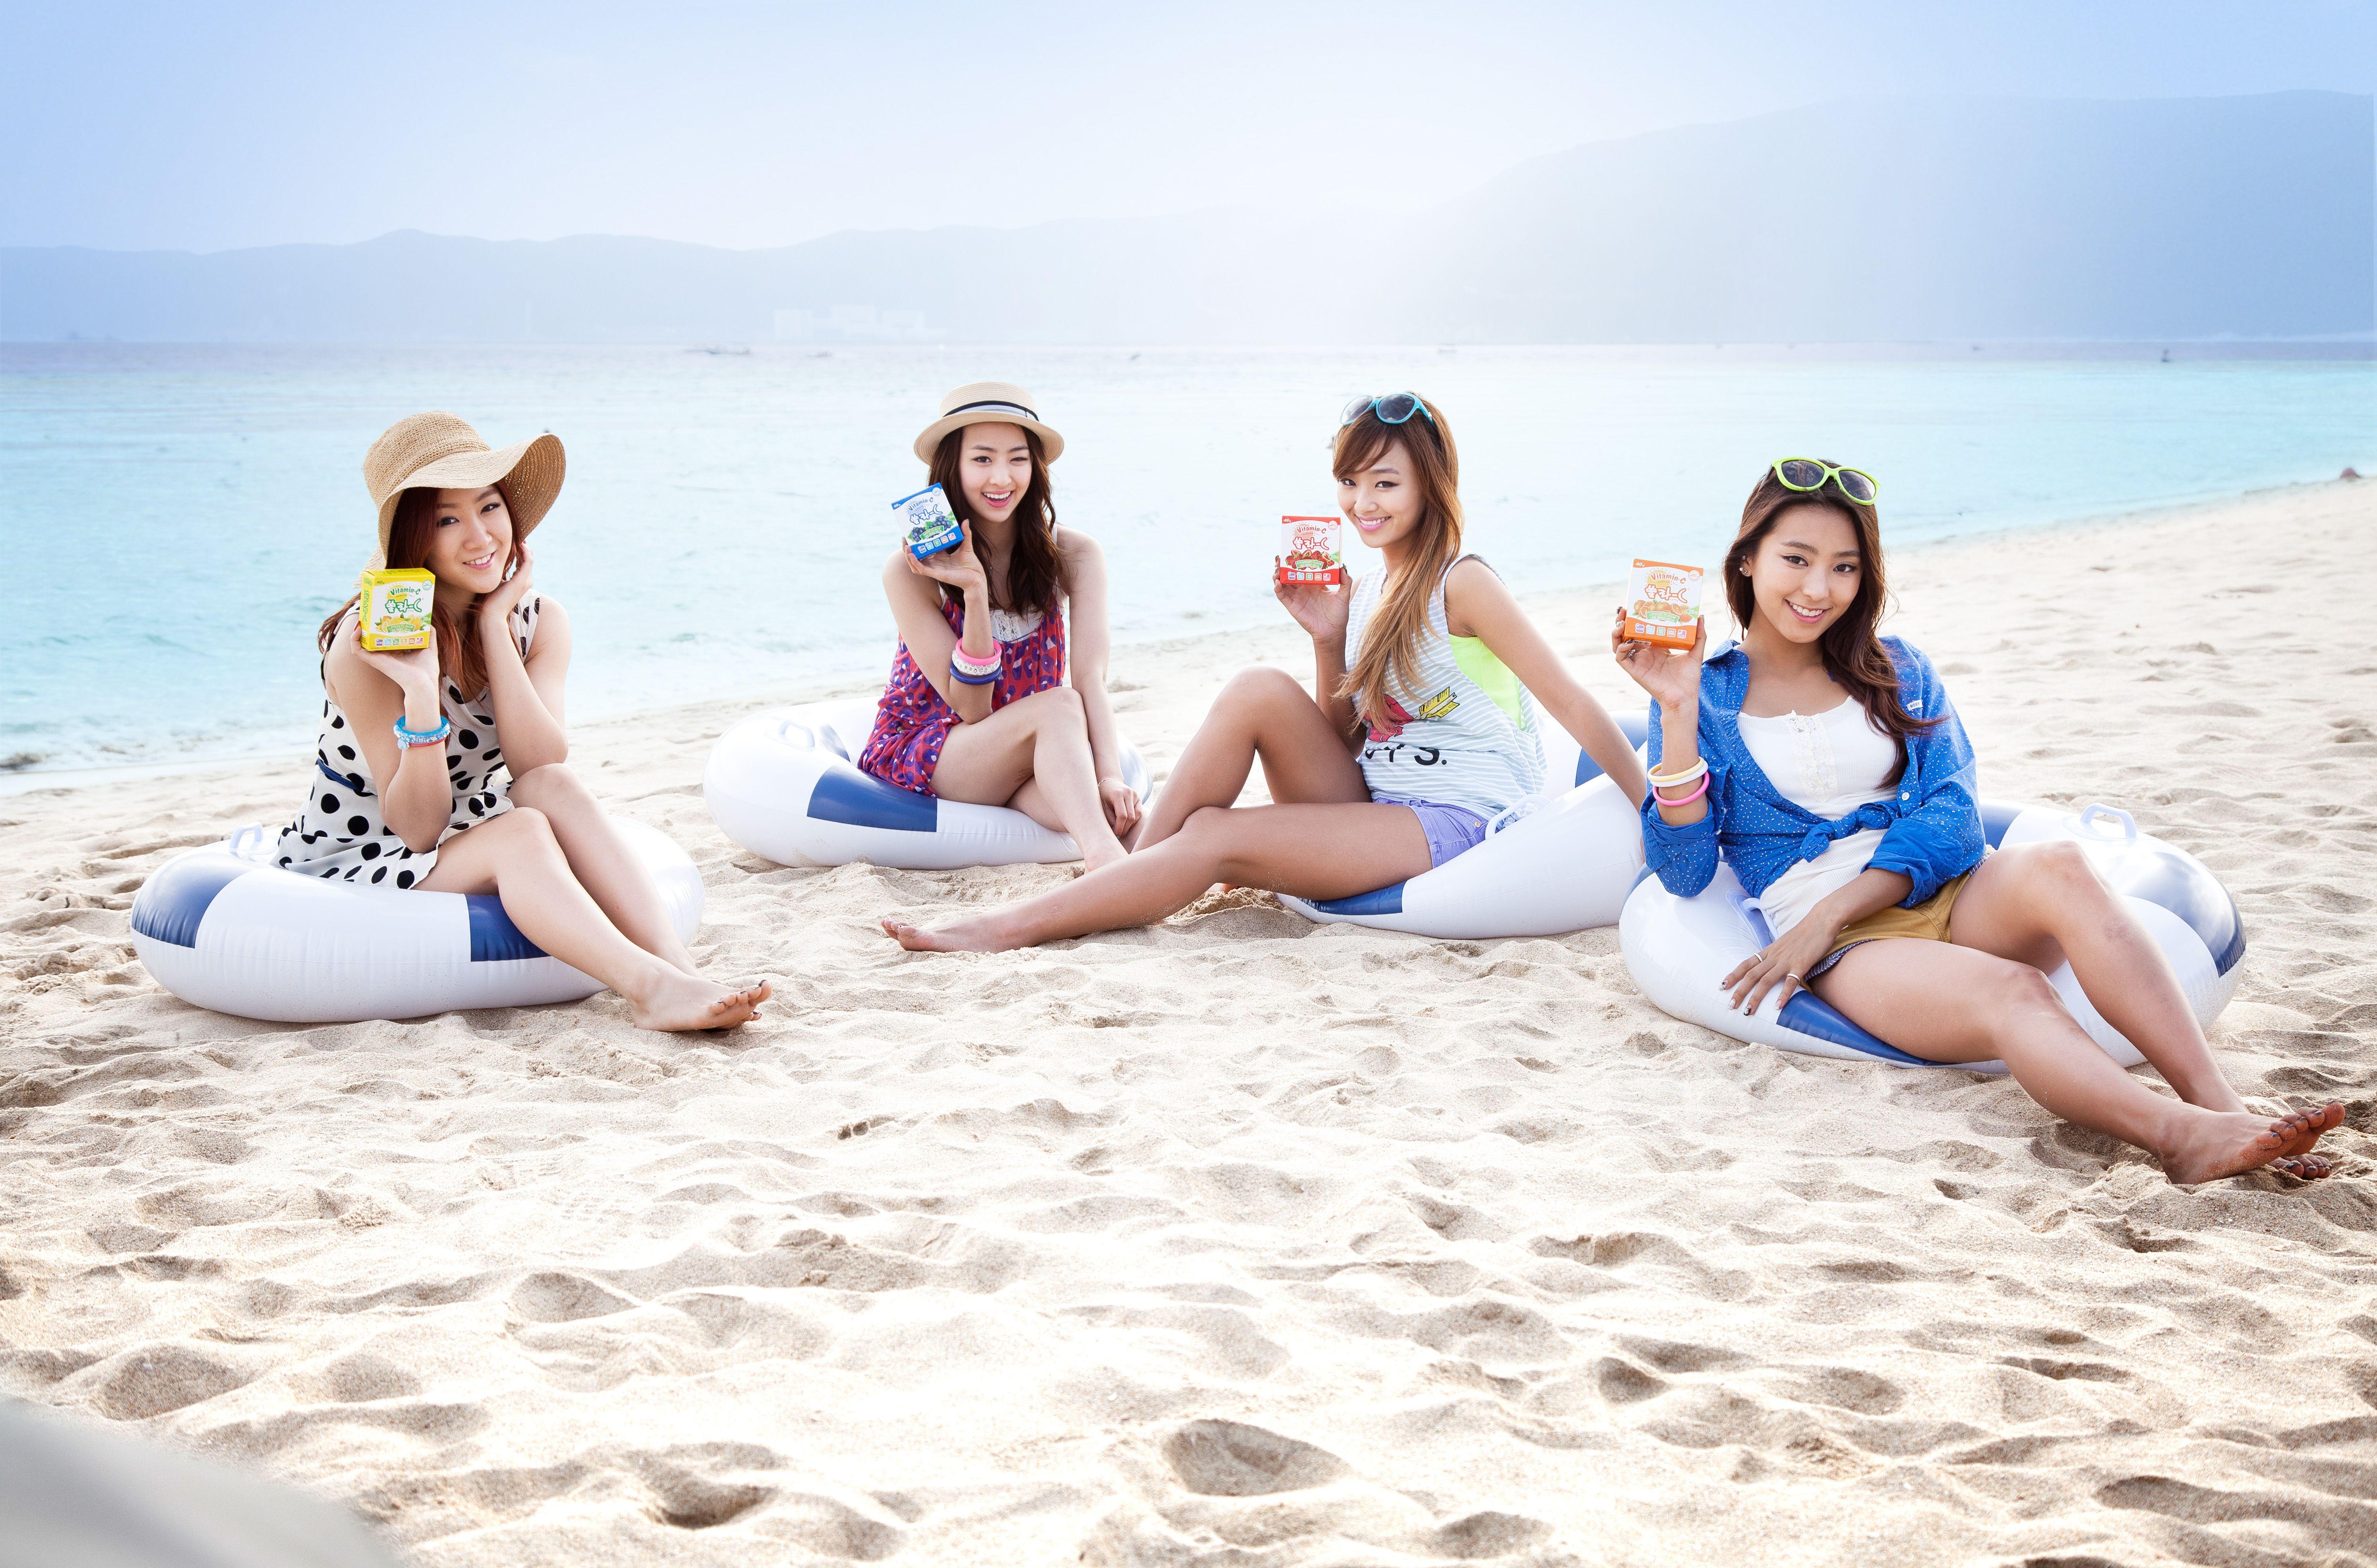 Google themes kpop - Explore Sistar Kpop Kpop Girls And More